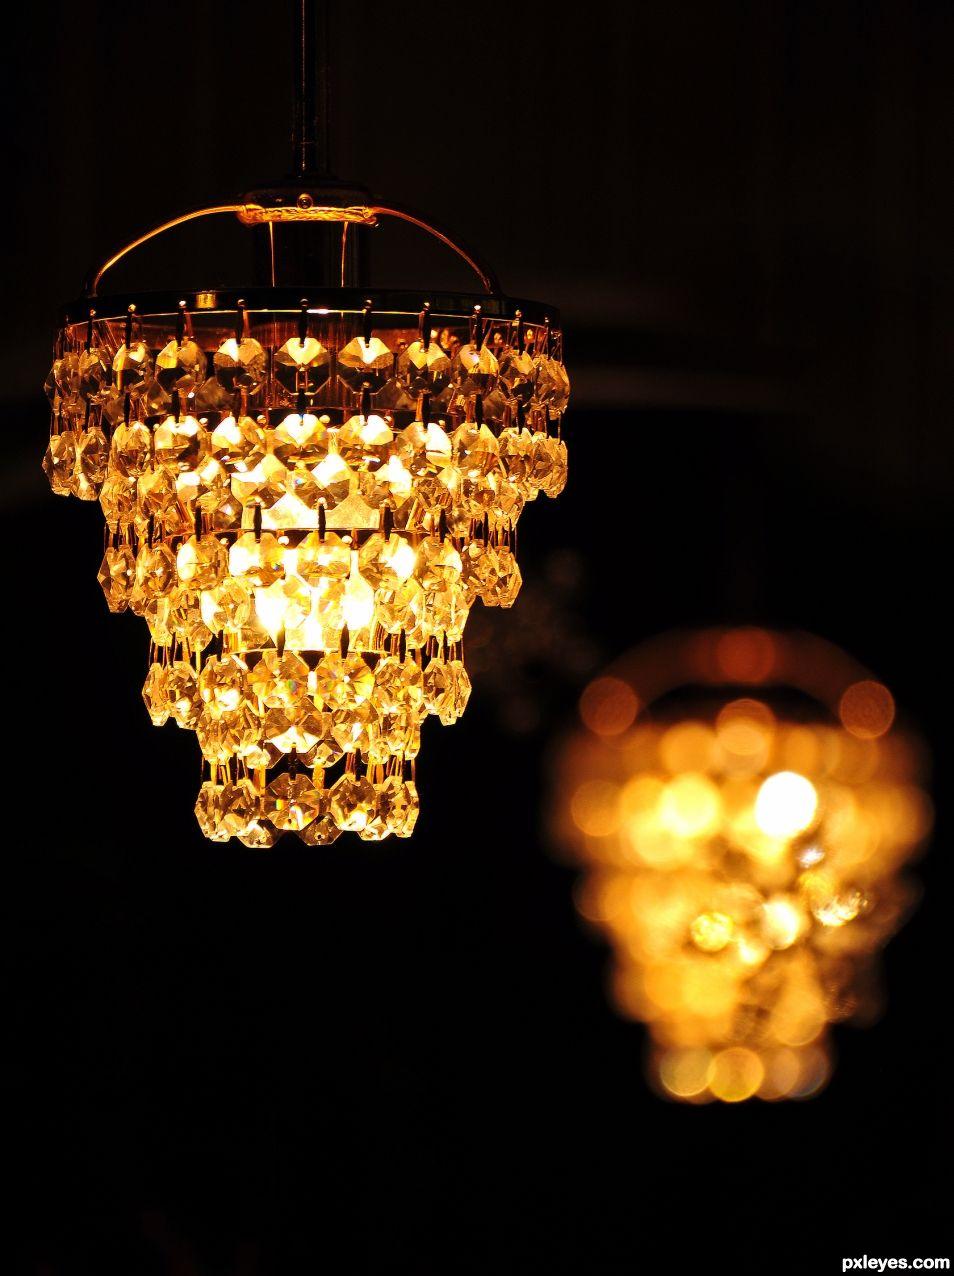 My home light